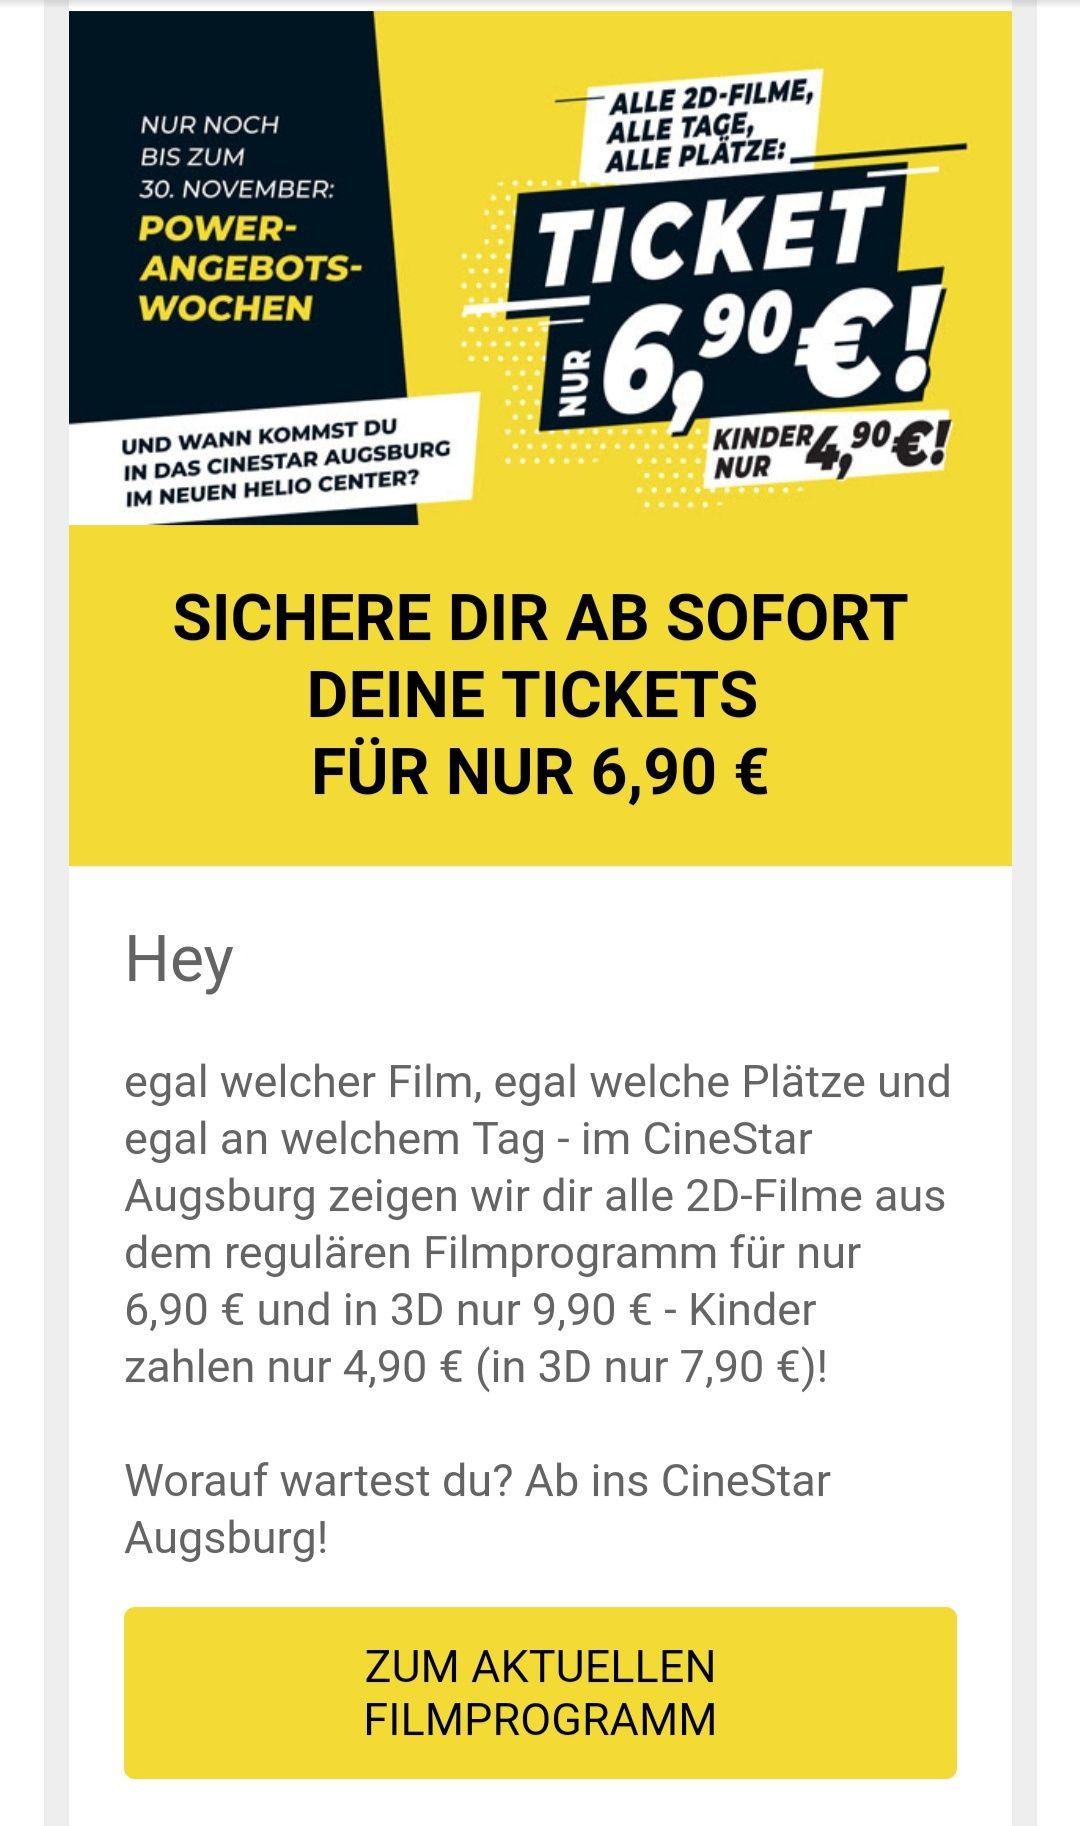 *Lokal* - Augsburg - CineStar - Kino